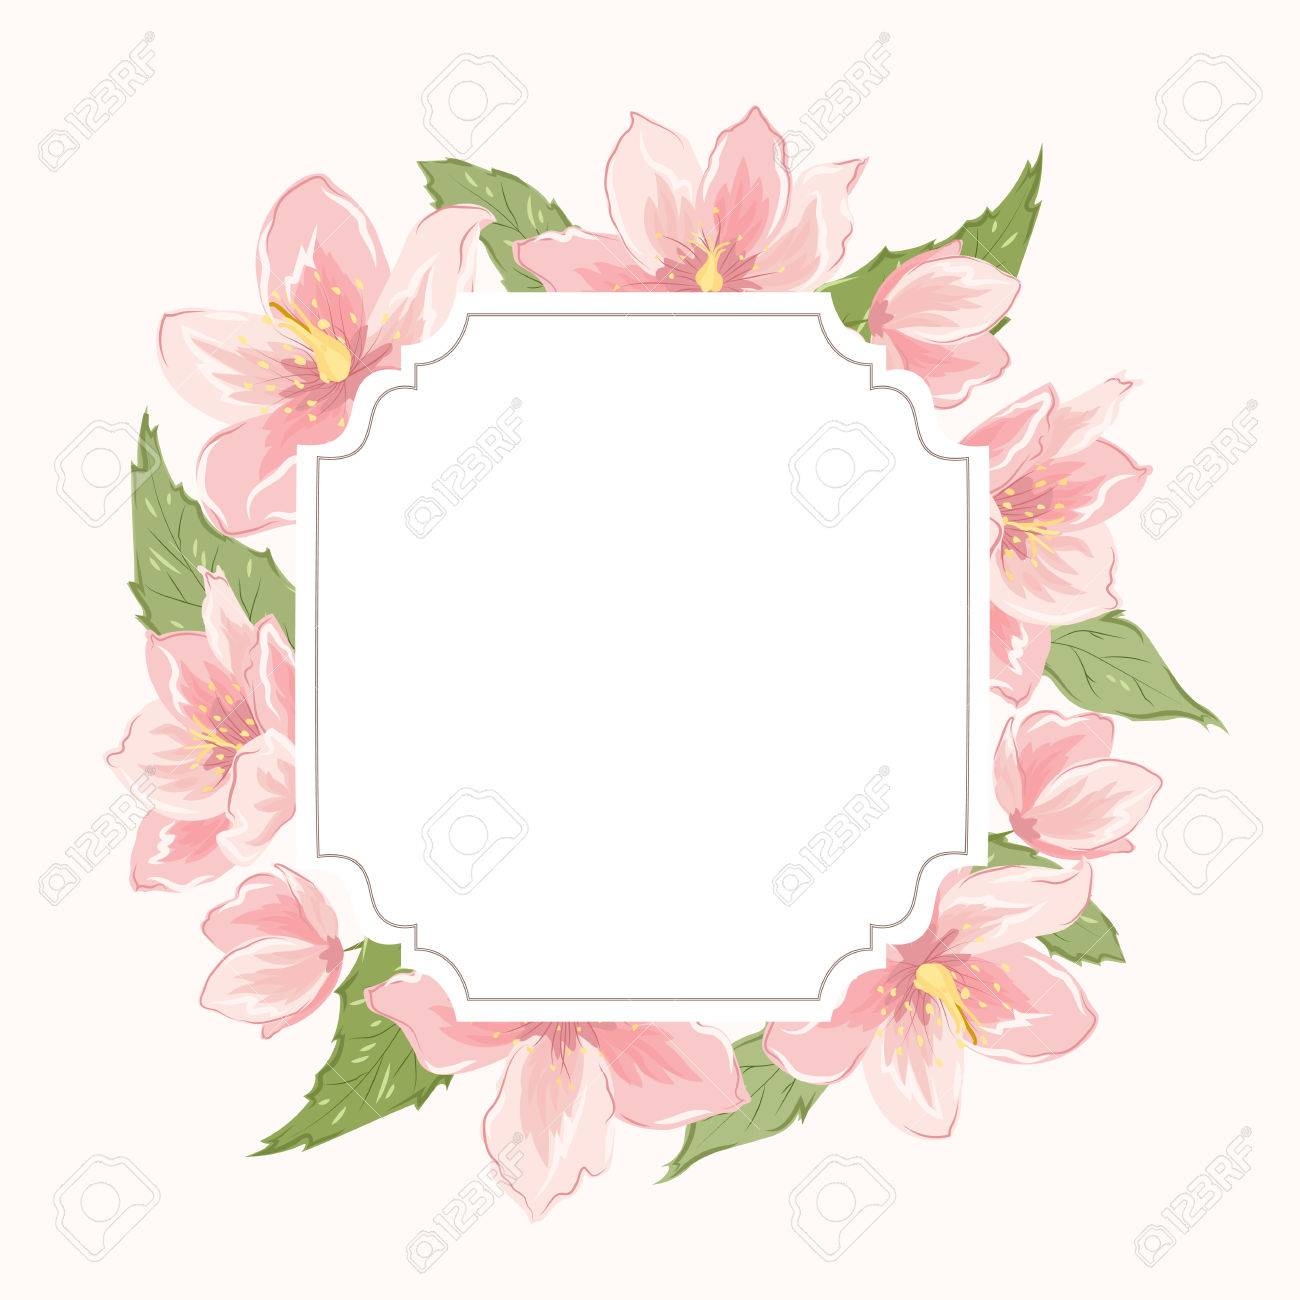 Blumenkranz Kranz-Grenze Rahmen. Sakura Magnolie Nieswurz Rosa ...